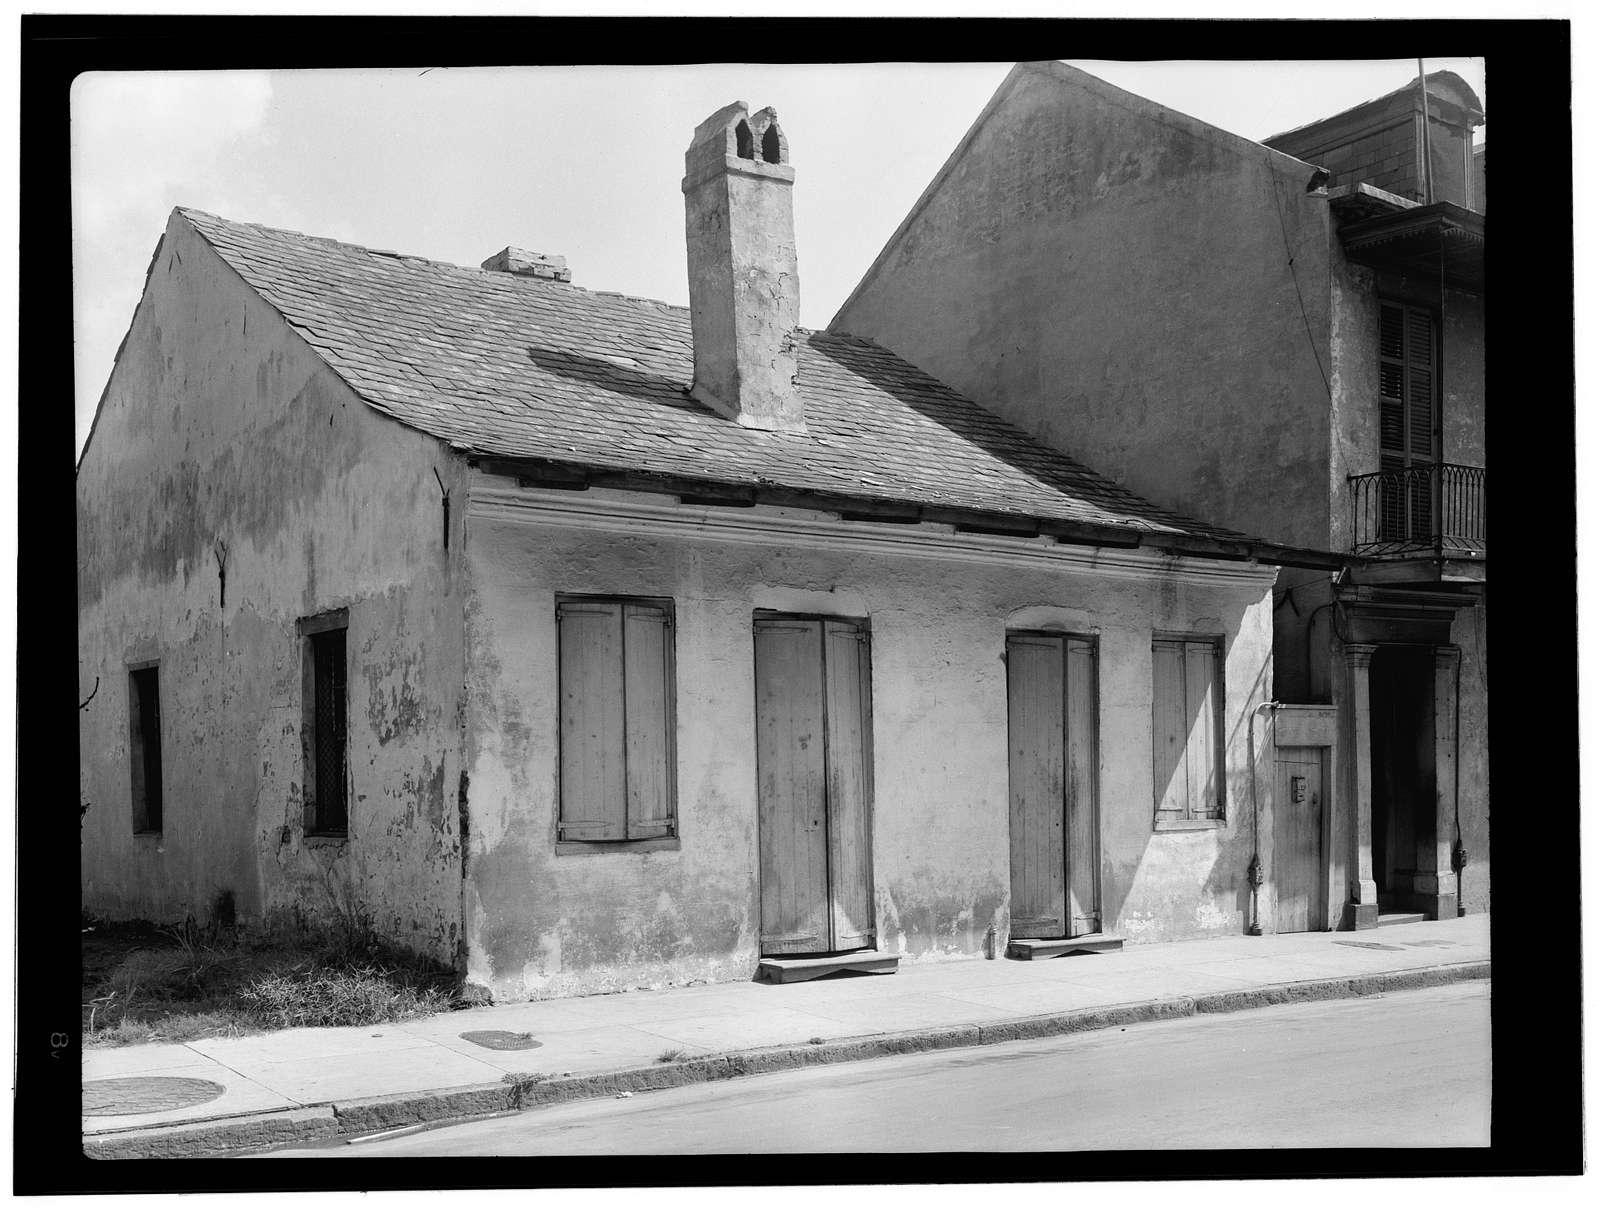 LaRionda Cottage, 1218-1220 Burgundy Street, New Orleans, Orleans Parish, LA